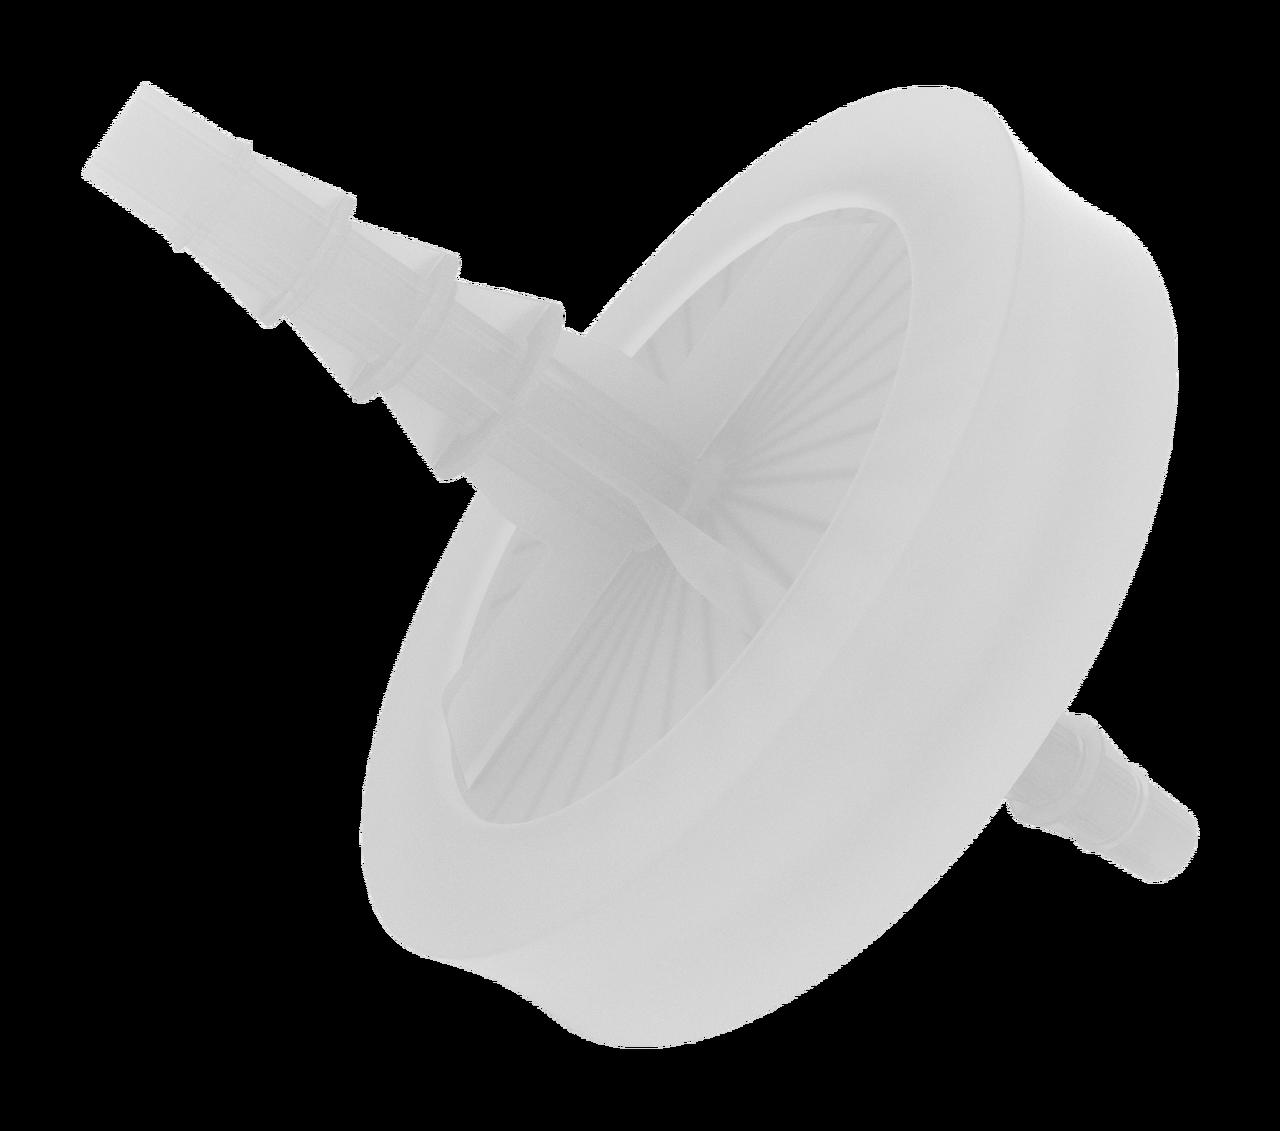 EZBio® Vent Filter, 0.22µm Non-Sterile, 40mm, Autoclave Only, 25/cs